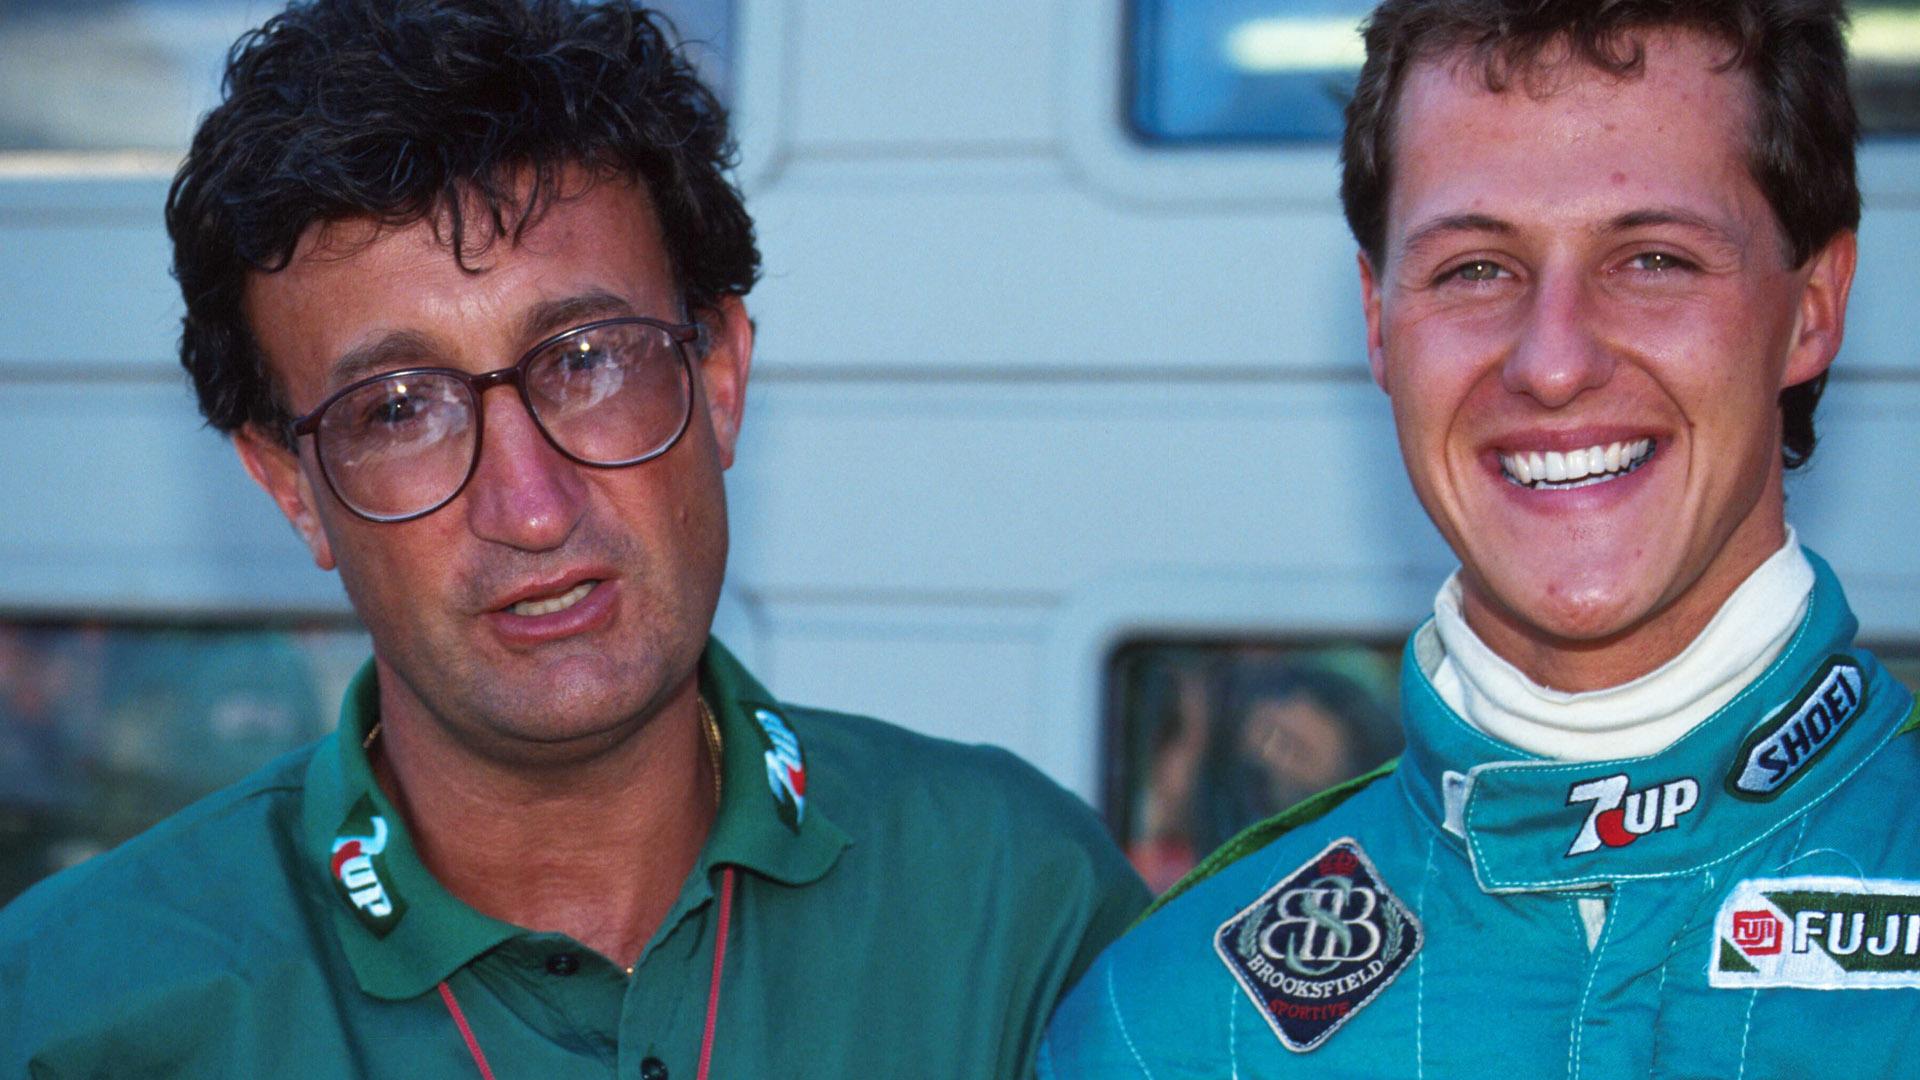 Eddie Jordan and Michael Schumacher in happier times.